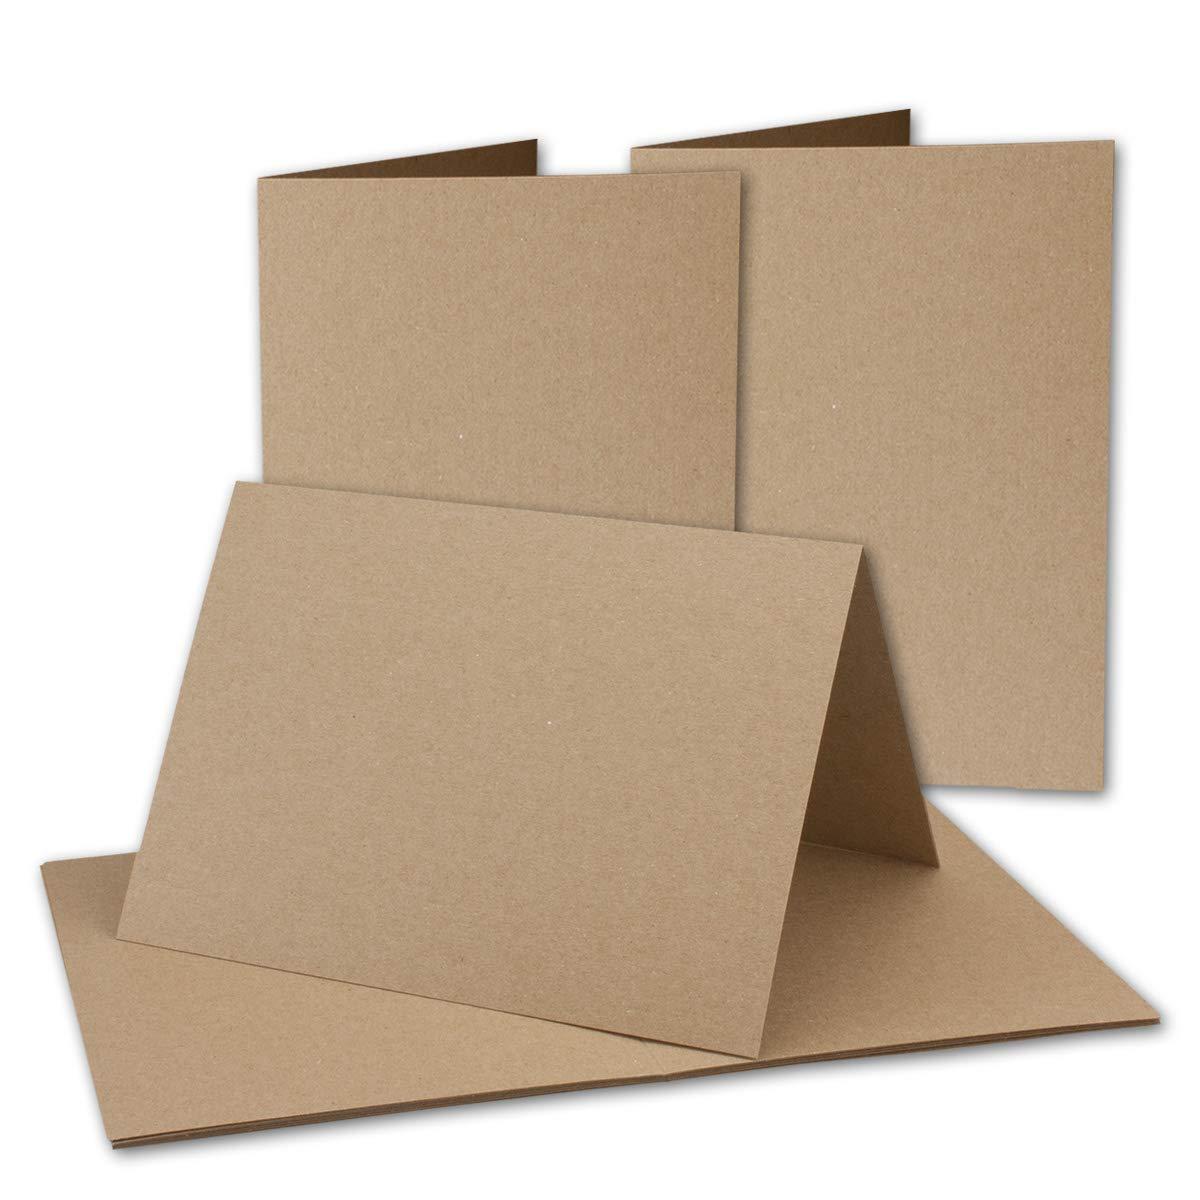 150x Vintage Kraftpapier Falt-Karten DIN B6-120 x 169 mm - sandbraun - Recycling - 350 g m² blanko Bastel-Karten I Umwelt by Gustav NEUSER® B07GFLQM8V | Erste Qualität